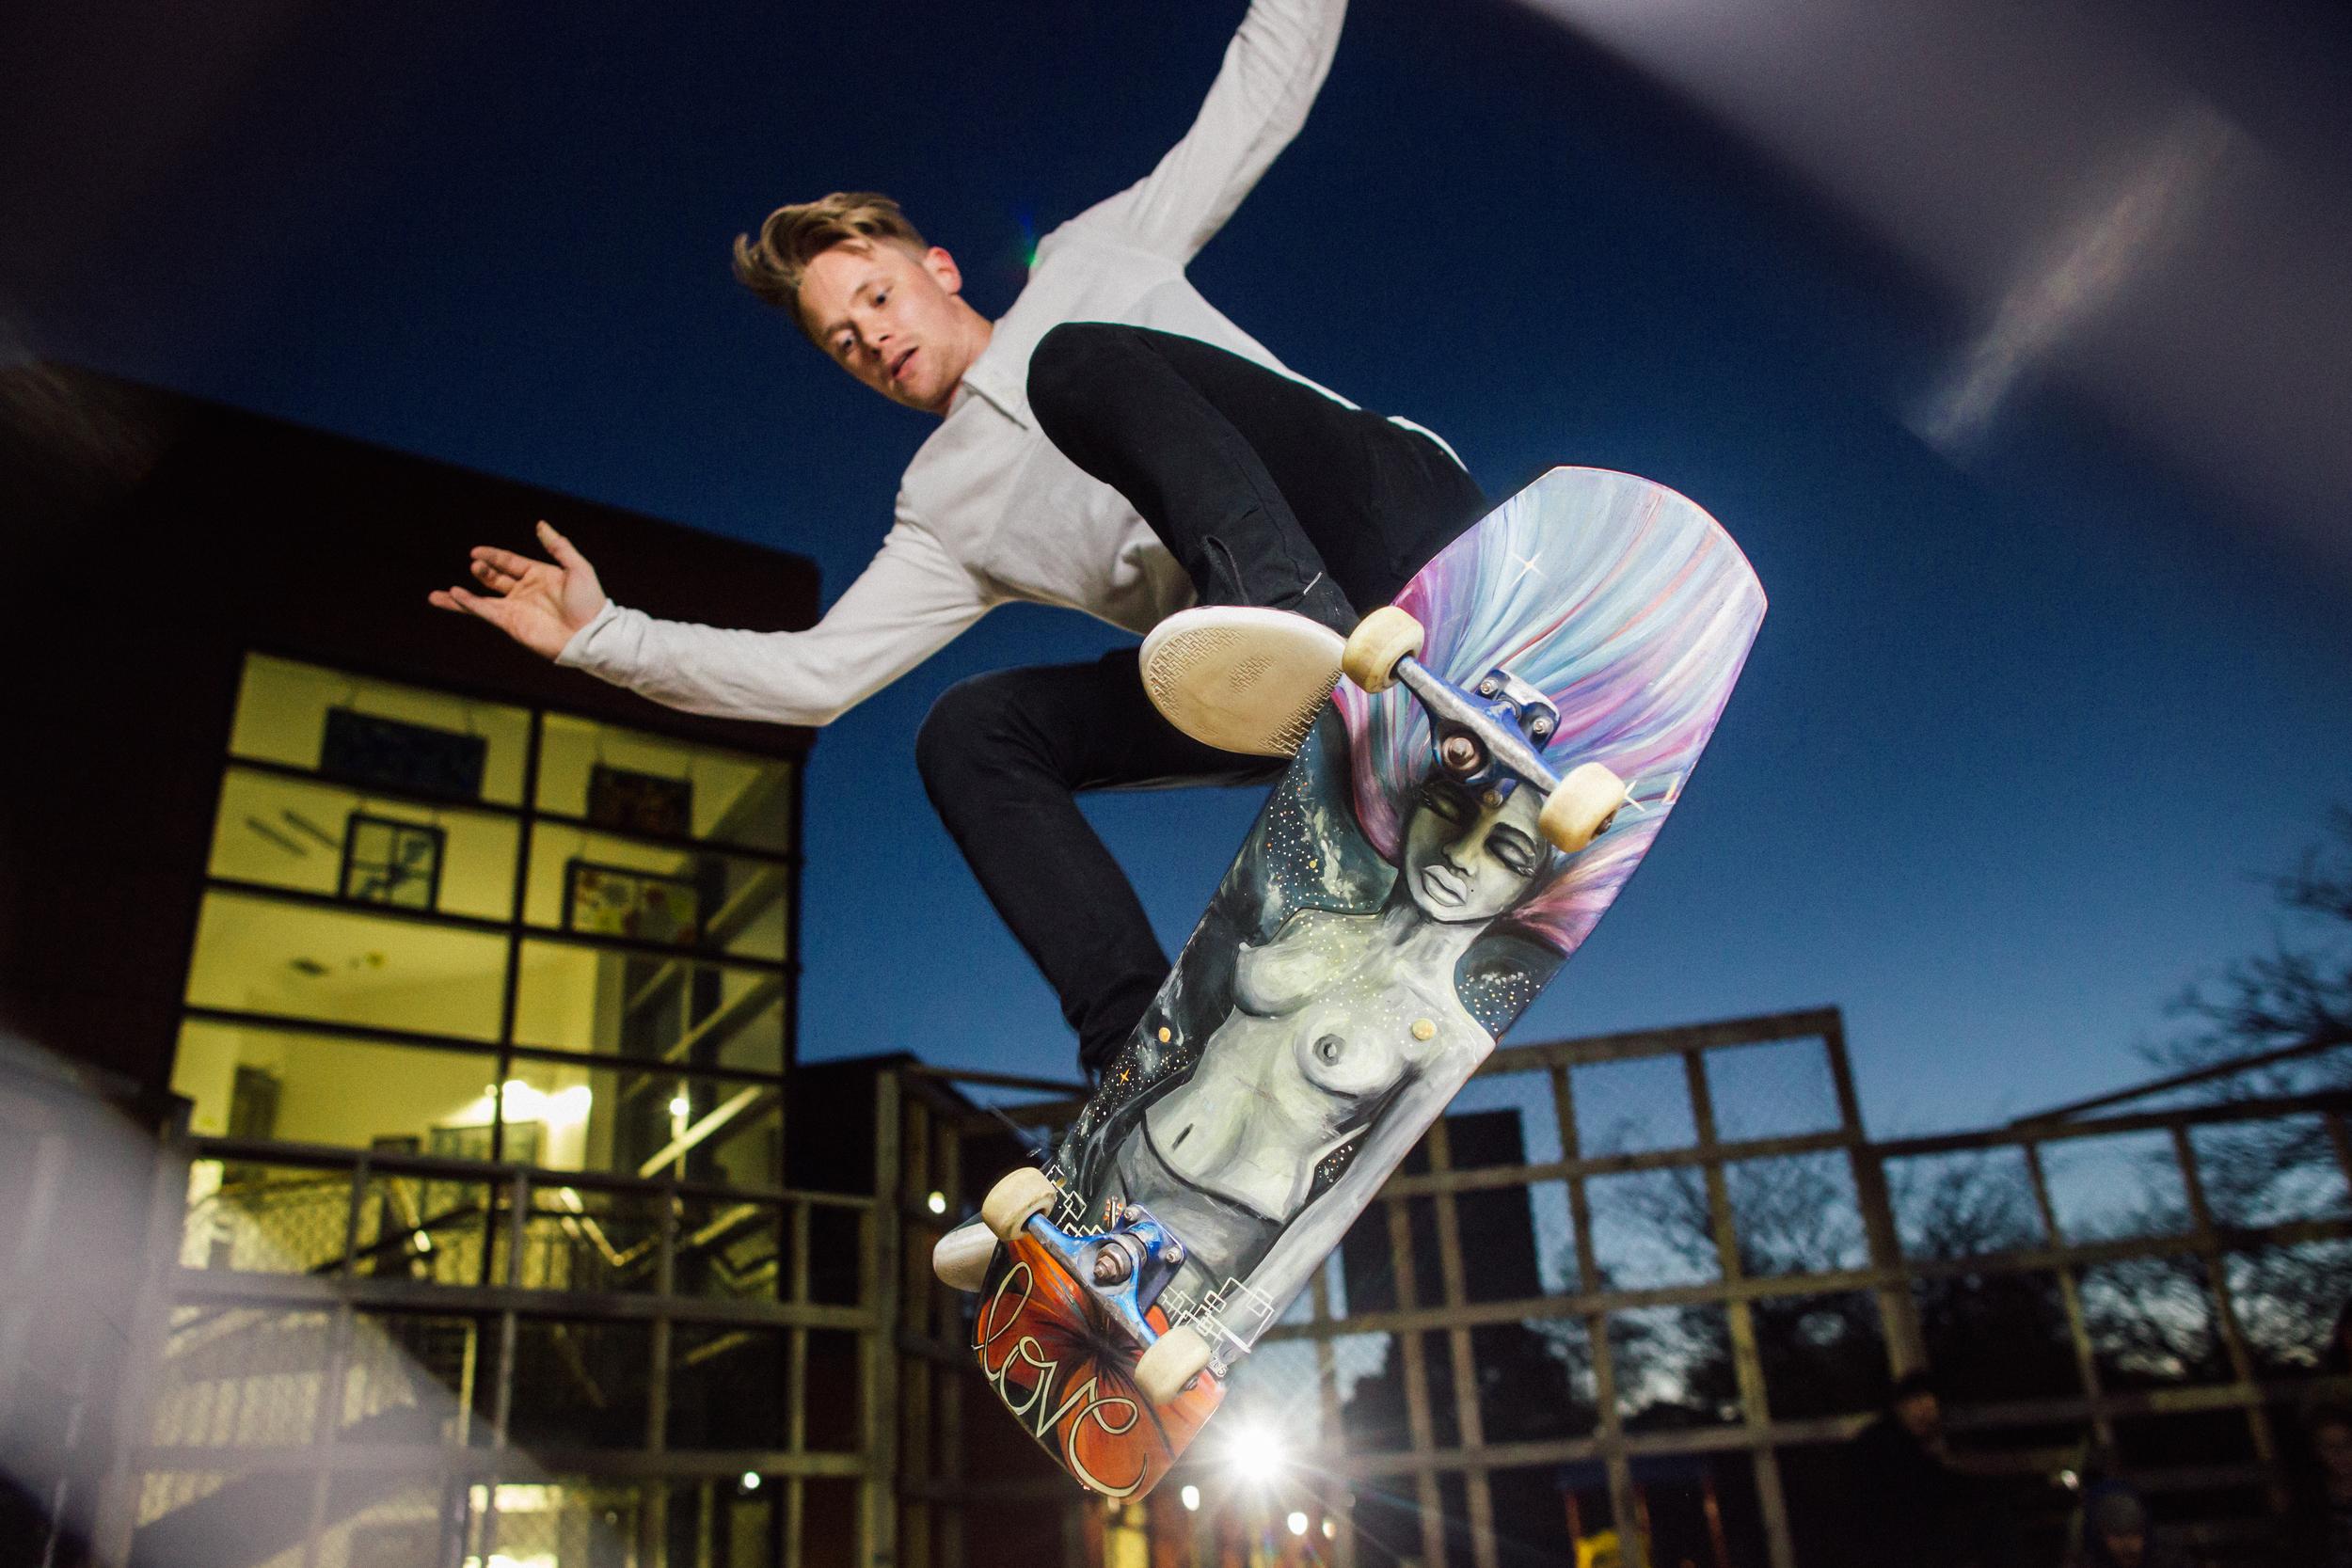 151023-183603-SkylerSkateboarding_DavidJohnsonPhotography_Mailyne Briggs_Dream Love Grow Art-0209.jpg